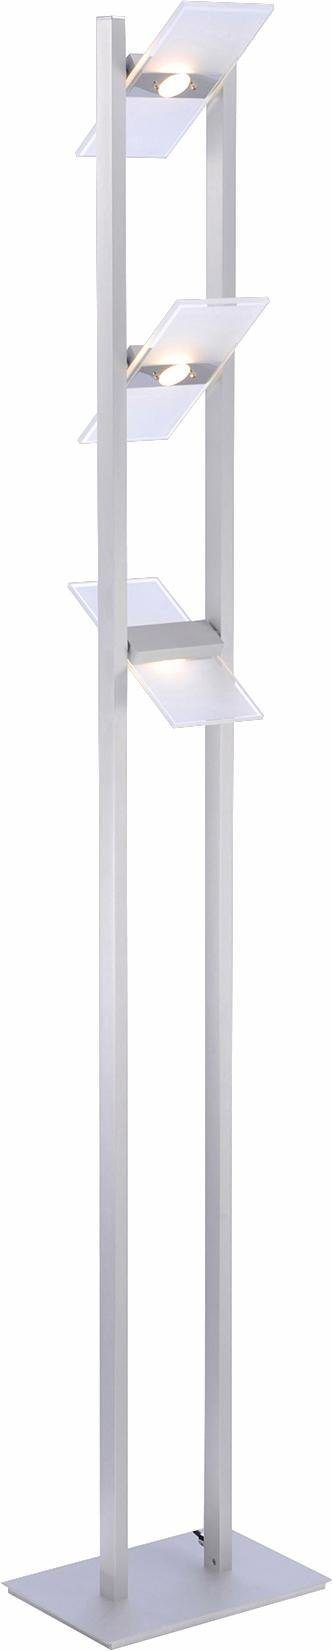 Paul Neuhaus LED-Stehleuchte silber, »PUKKA«, Energieeffizienzklasse: A+ Jetzt bestellen unter: https://moebel.ladendirekt.de/lampen/stehlampen/standleuchten/?uid=e10c6fdc-3ca0-5340-a1e3-115d5ce2591f&utm_source=pinterest&utm_medium=pin&utm_campaign=boards #stehlampen #leuchten #lampen #ledstehleuchte